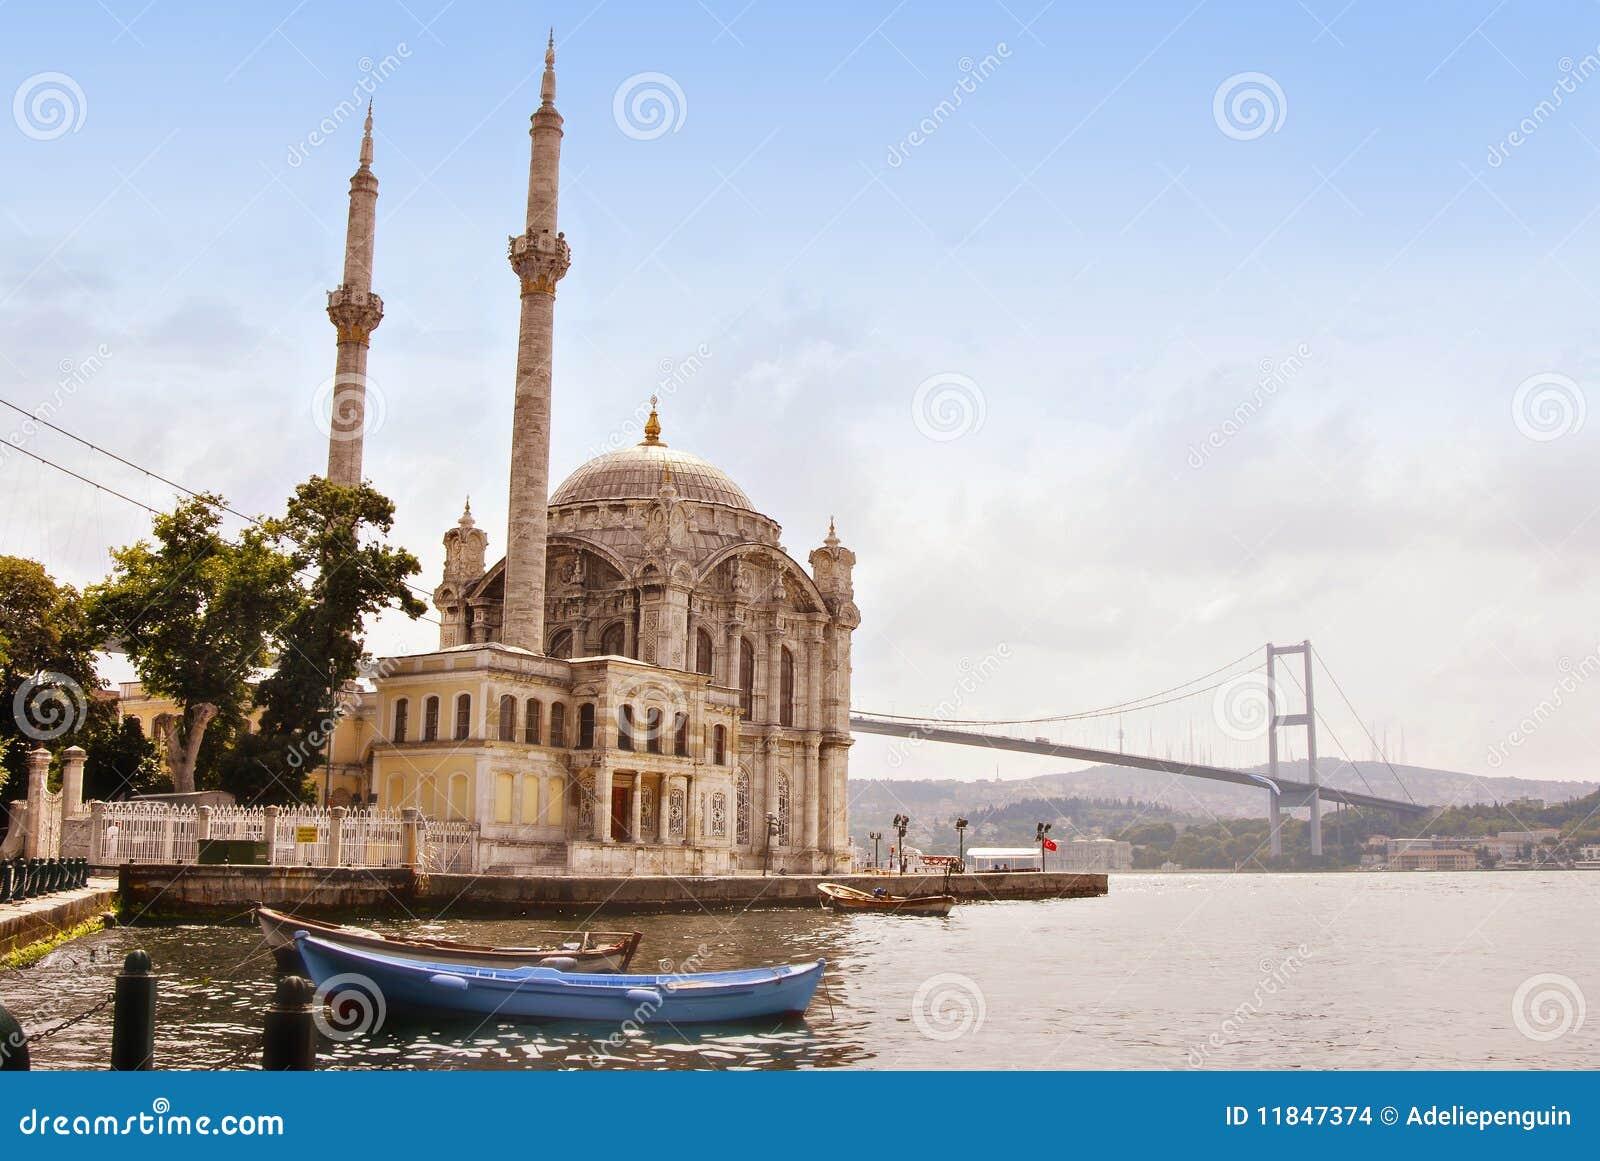 индюк bosporus istanbul